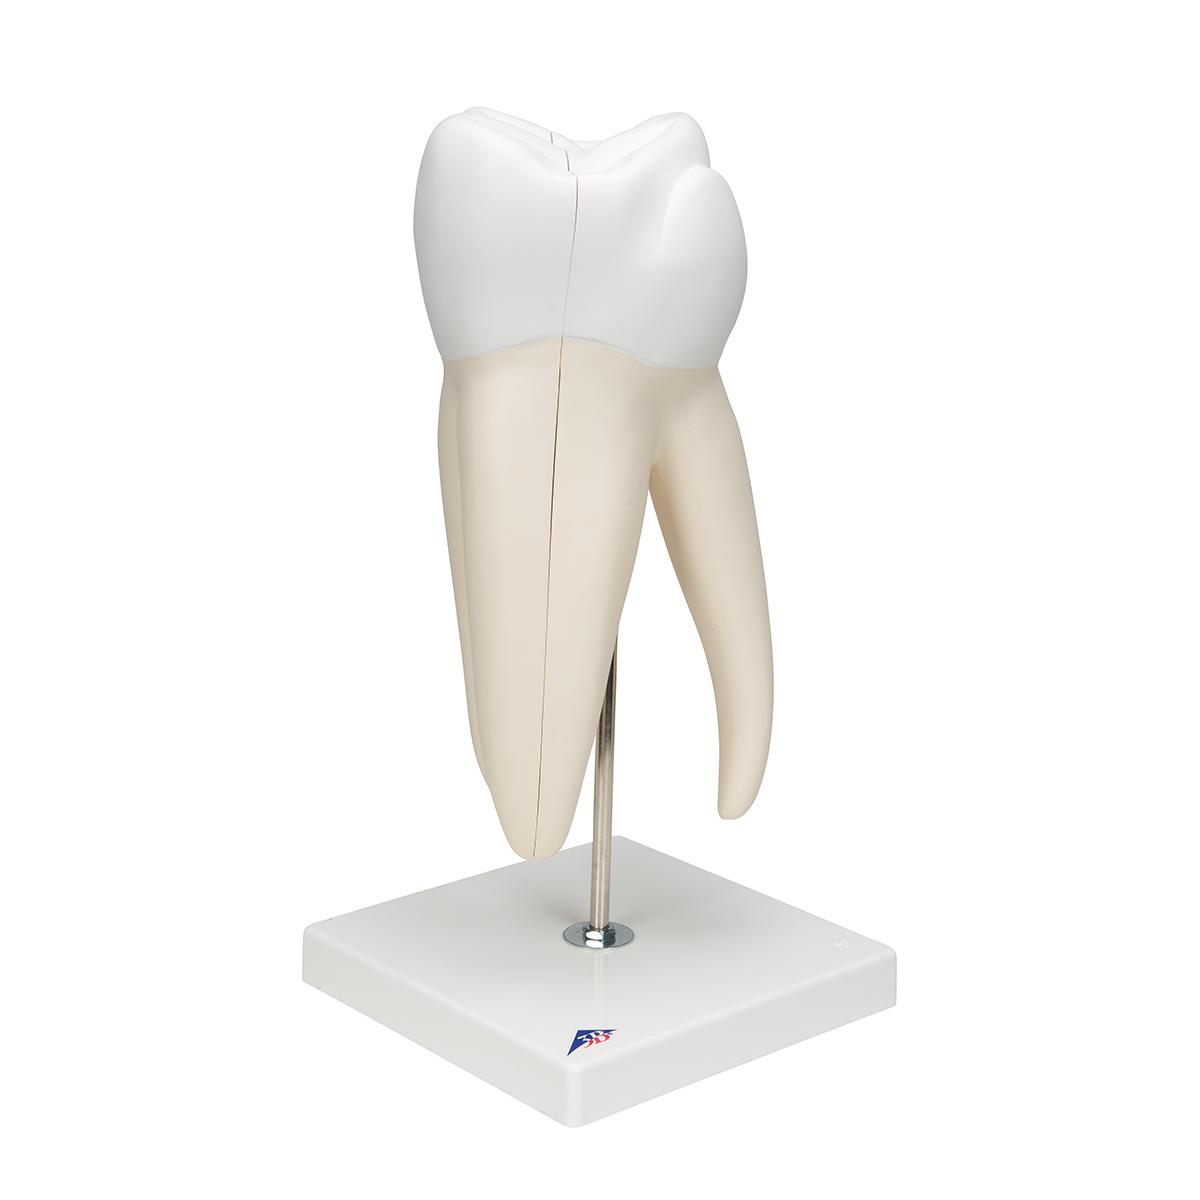 Anatomical Teaching Models Plastic Human Dental Models Giant